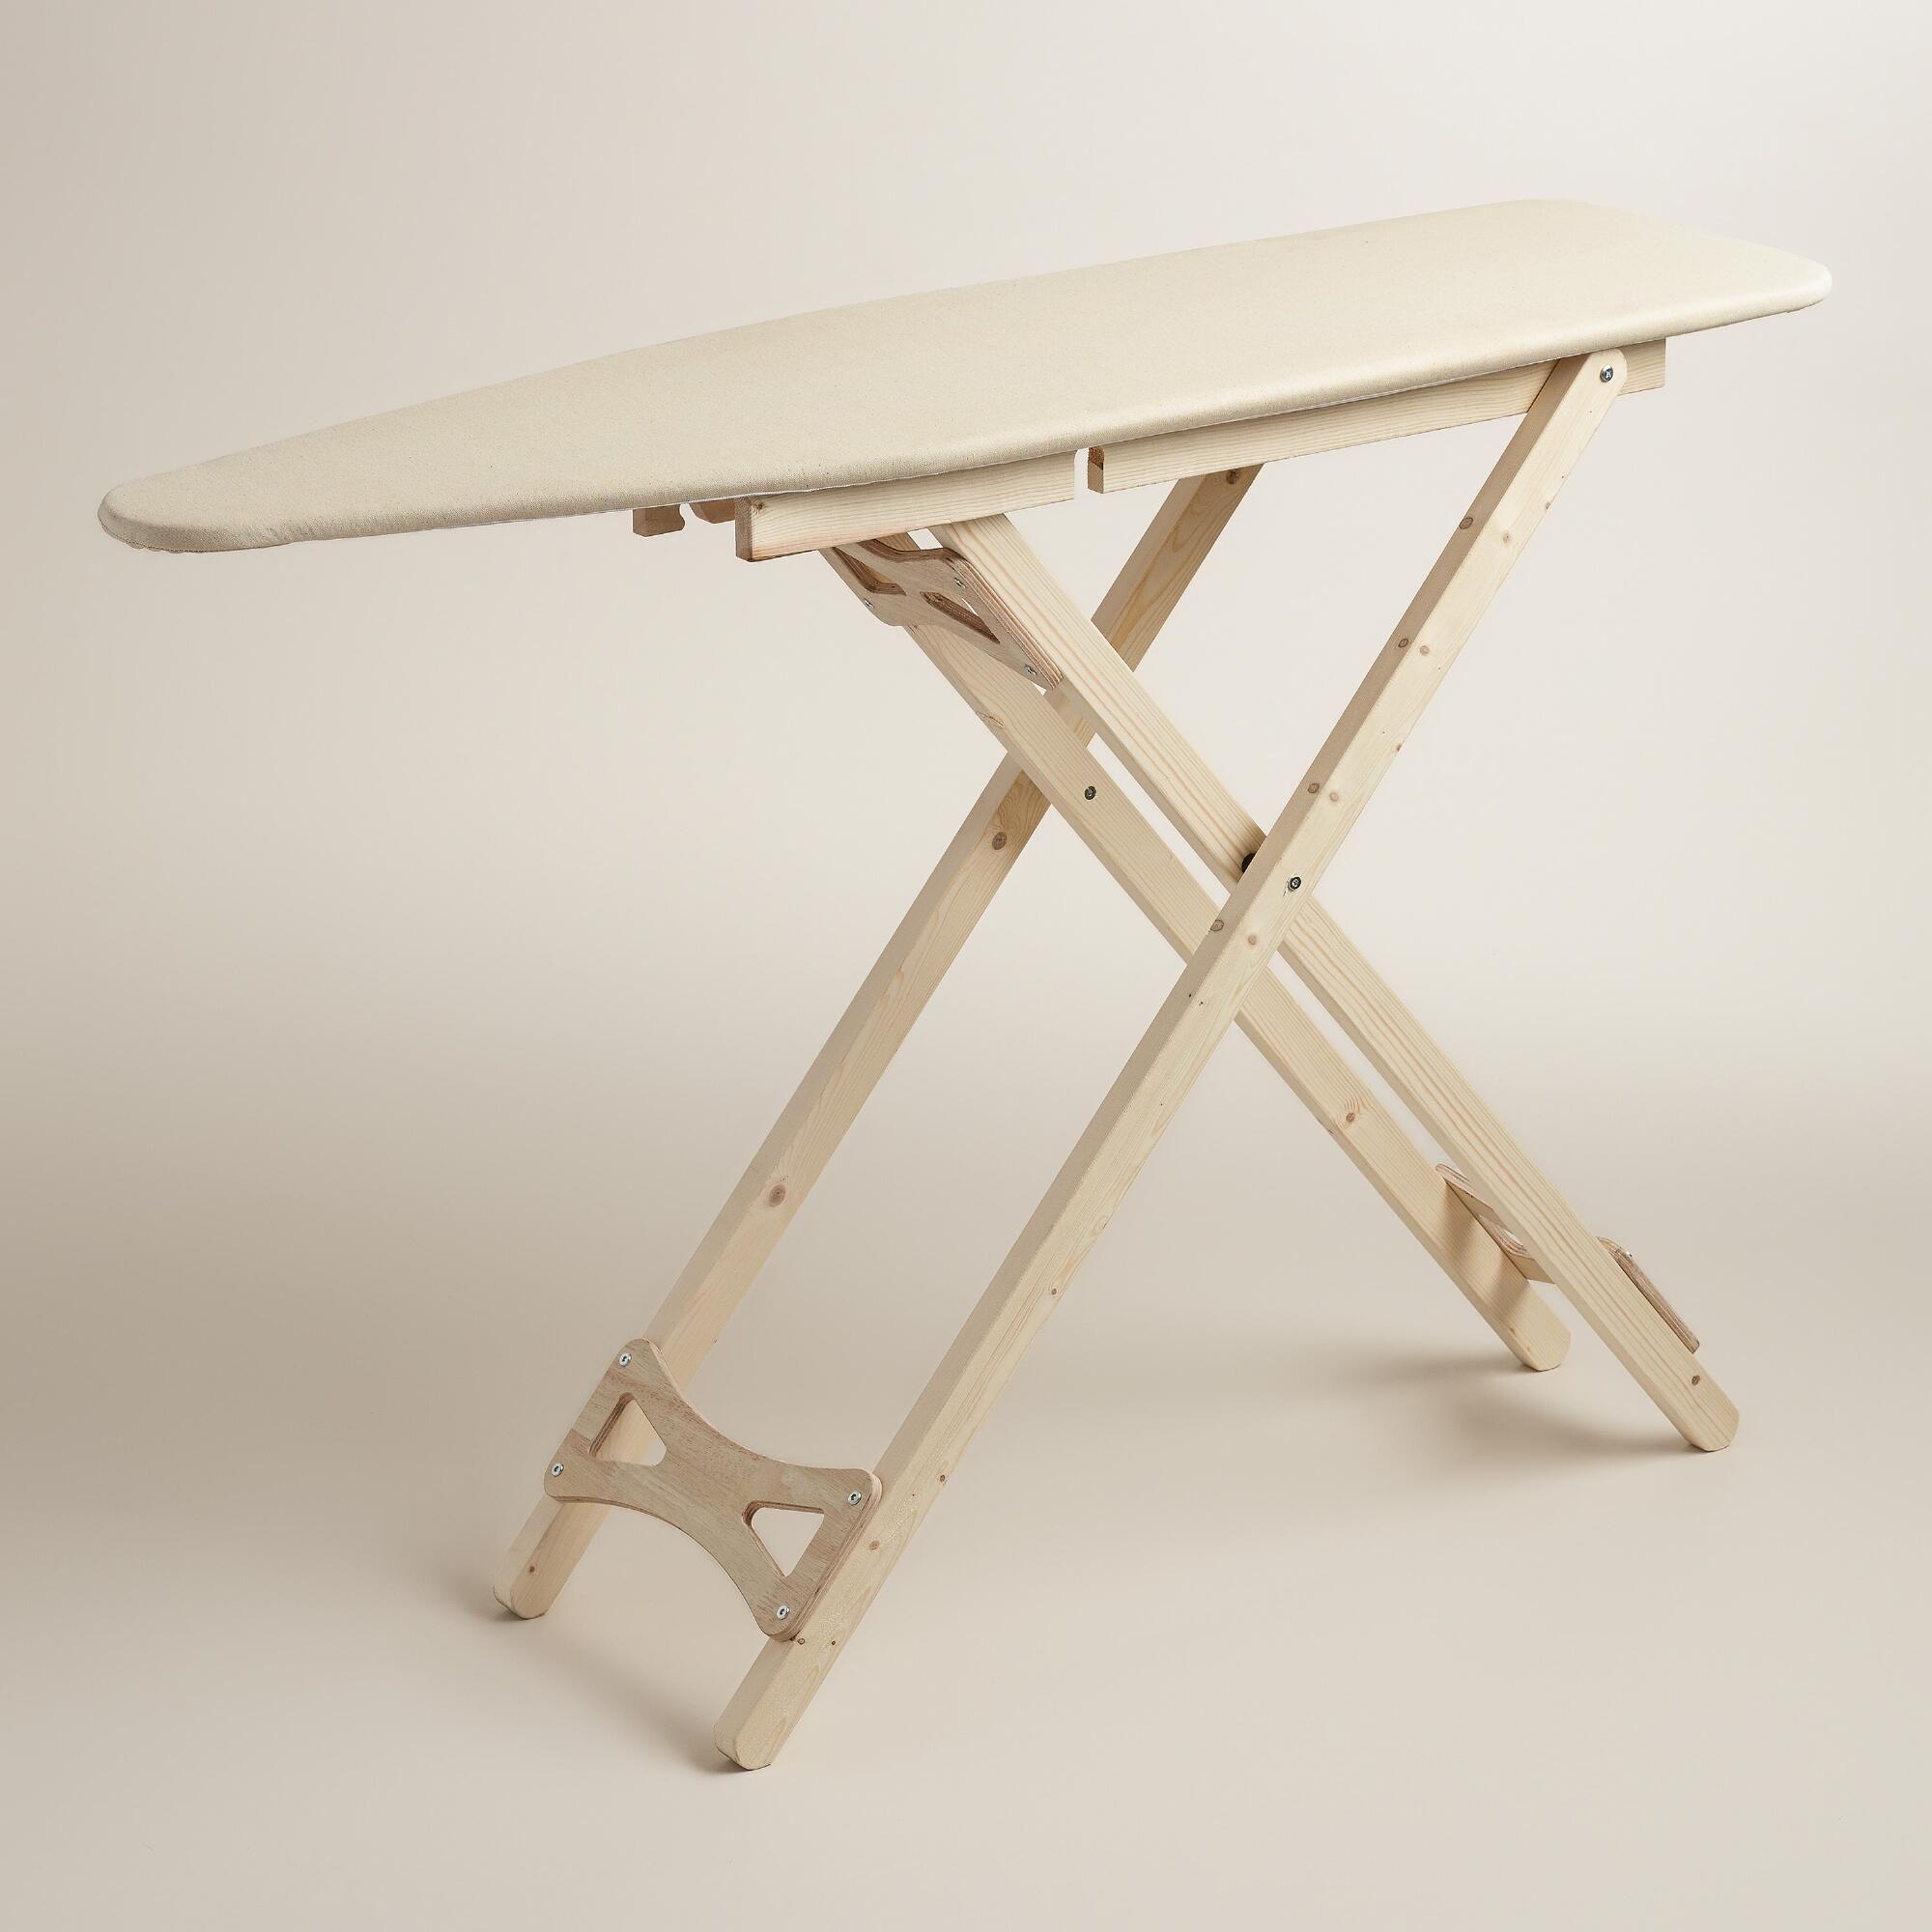 Wood Ironing Board Wood Ironing Boards Wooden Ironing